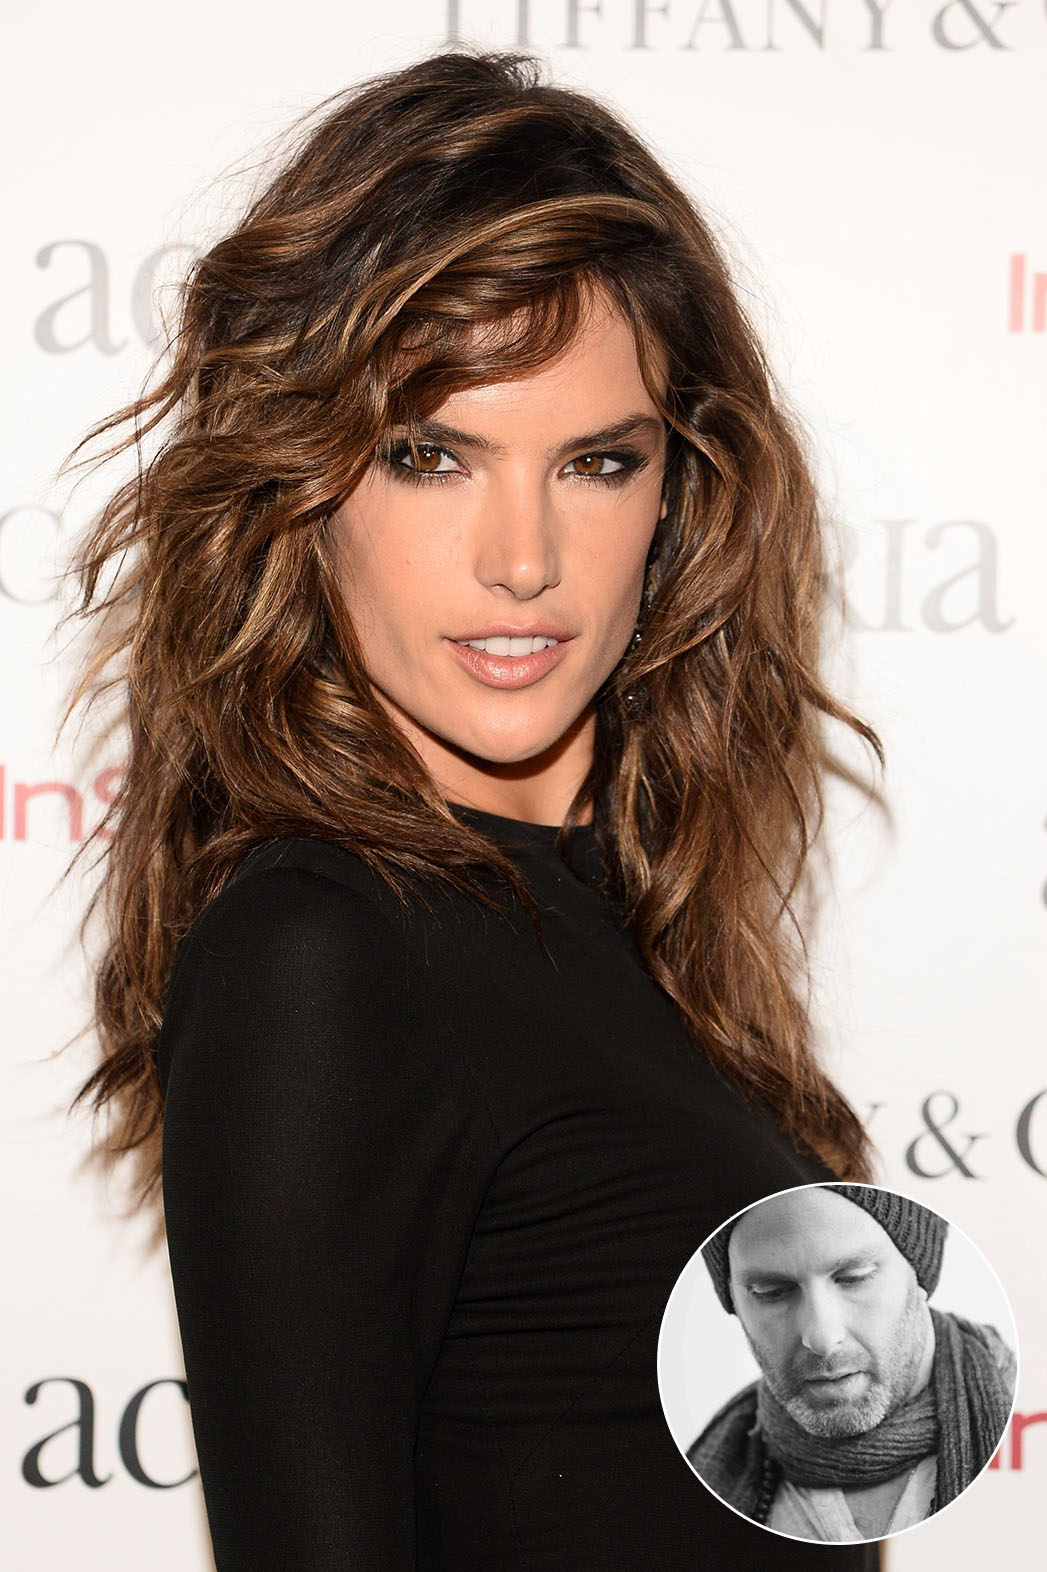 Alessandra Ambrosio Messy Hair Inset - P 2014